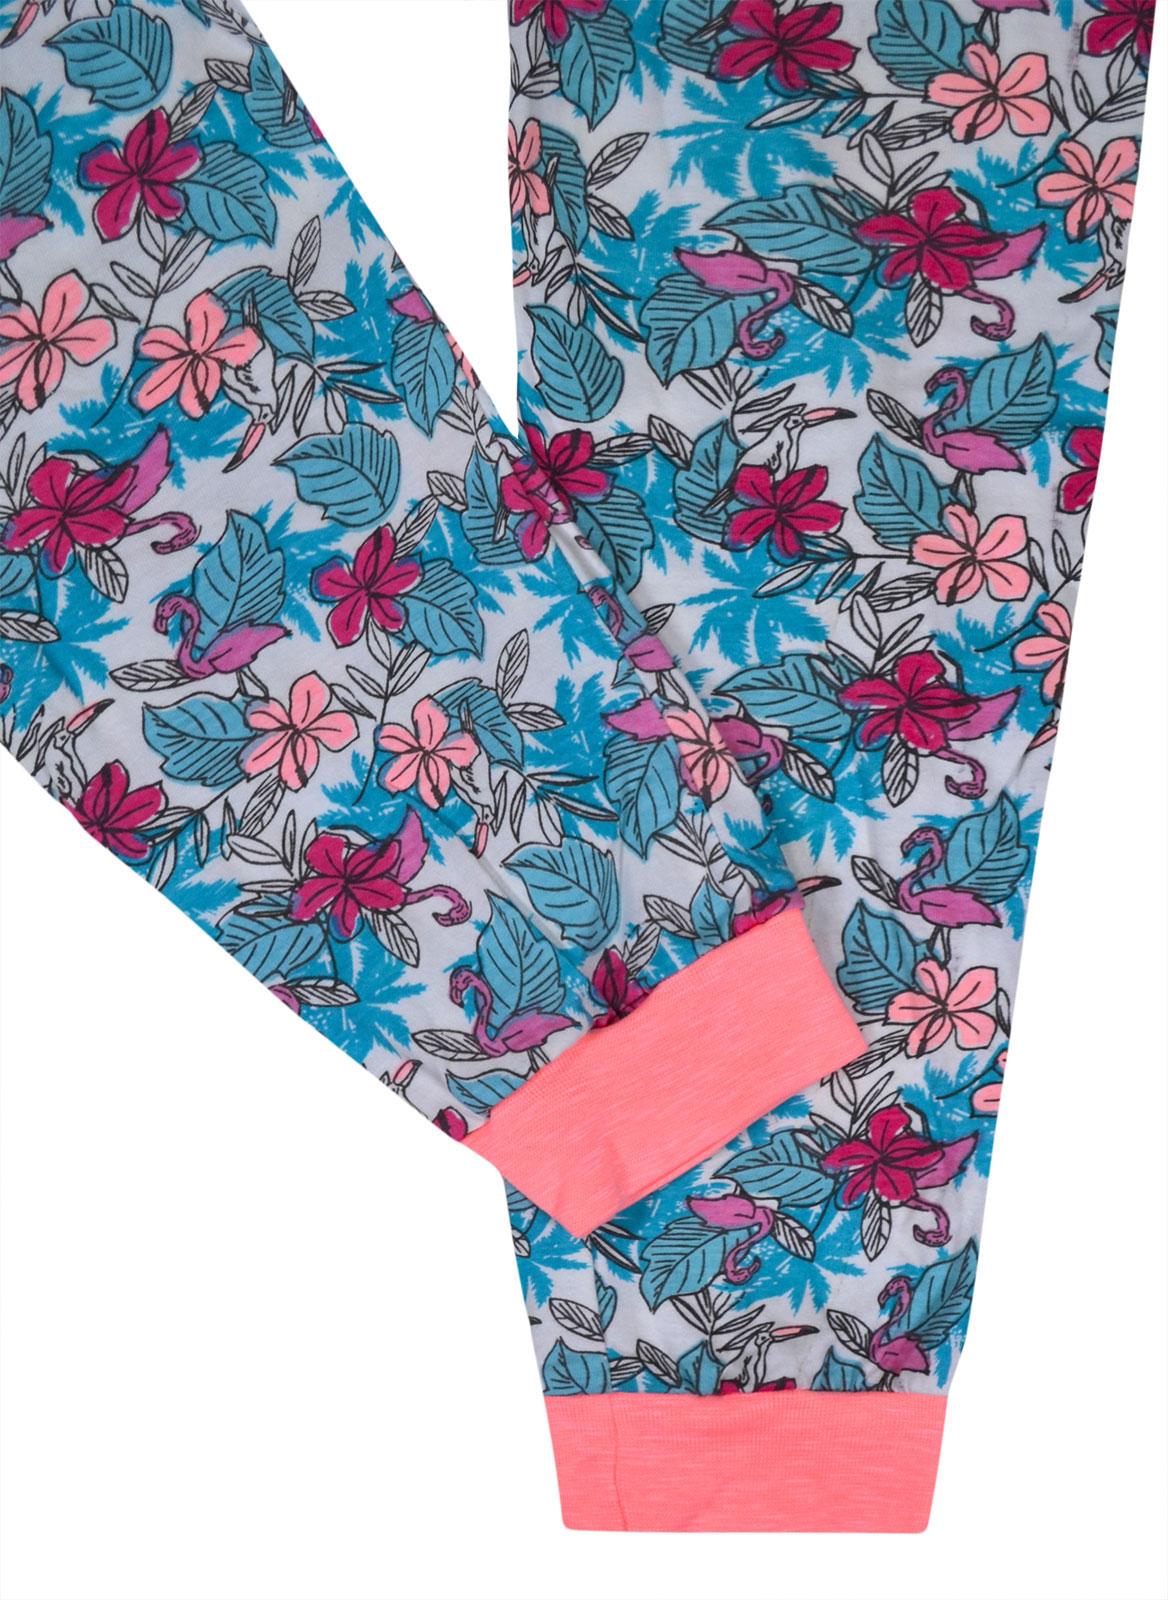 Full Length /& Floral Machine Washable jolly rascals Girls Nightwear Cotton Blend Crew Neck